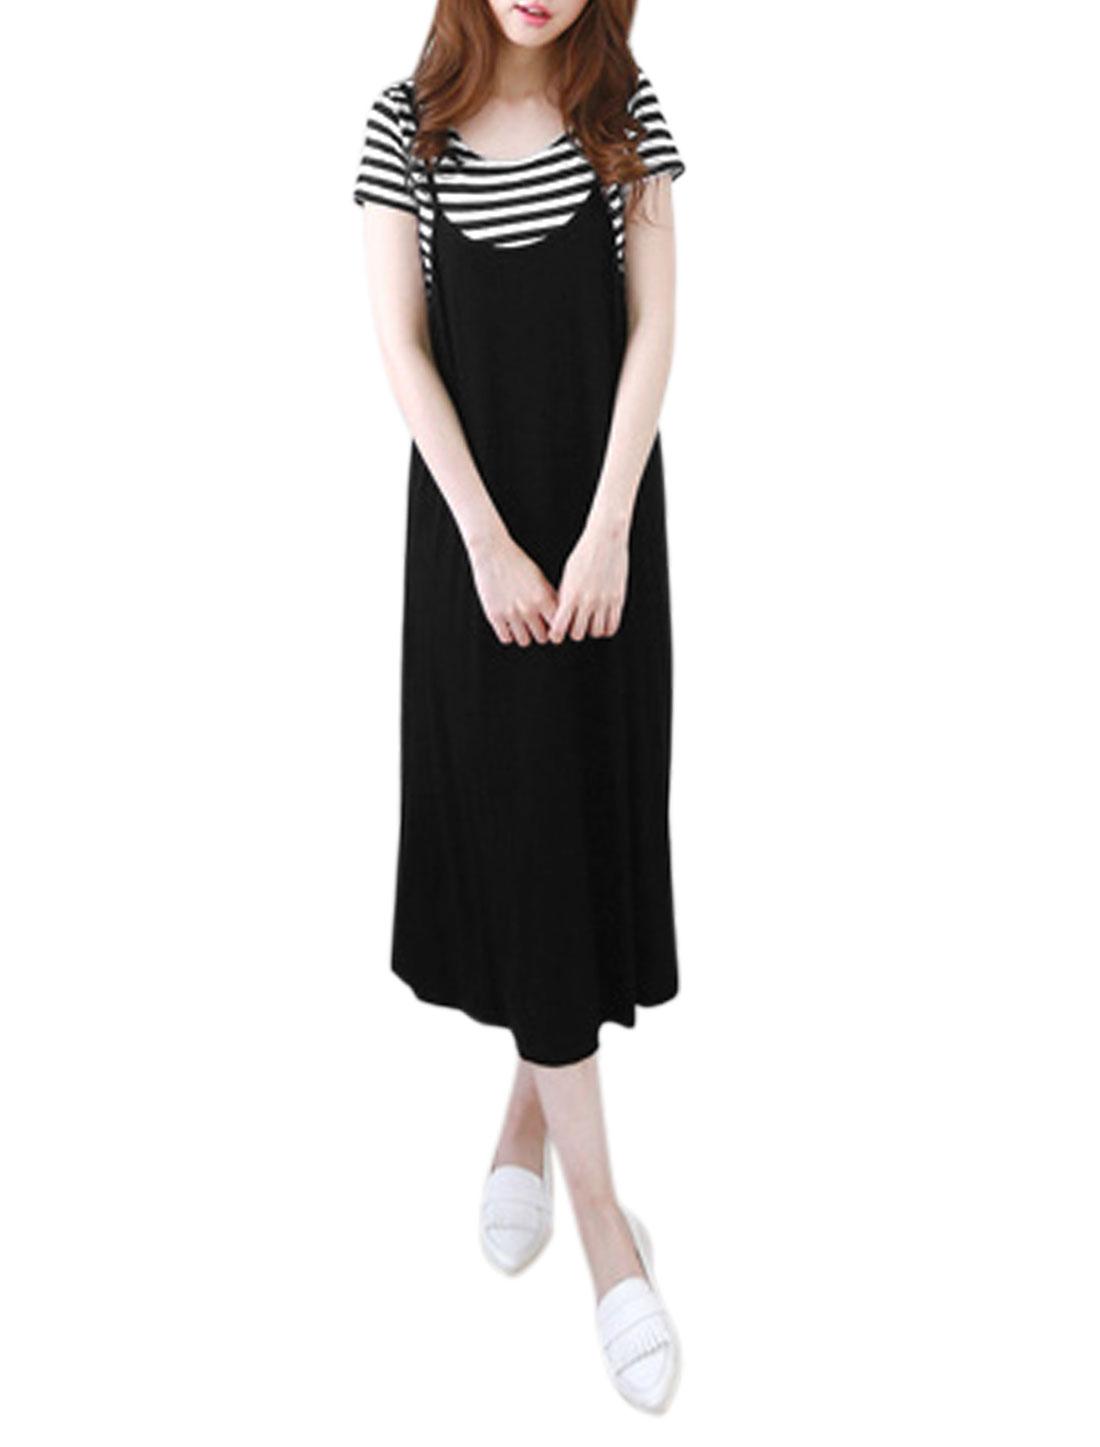 Ladies Stripes T-Shirt w Spaghetti Strap Unlined Casual Cami Dress Black XS